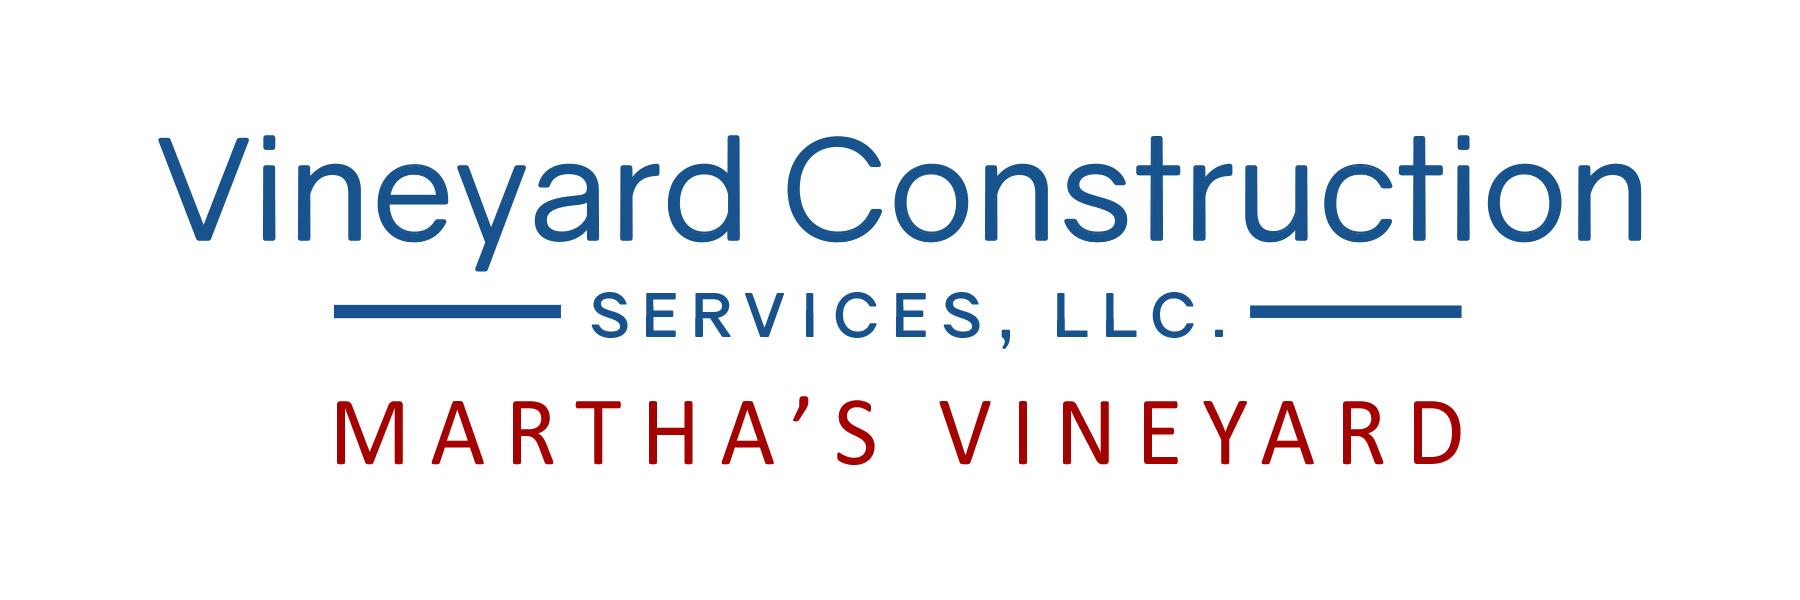 Vineyard Construction_Final_Logo.jpg